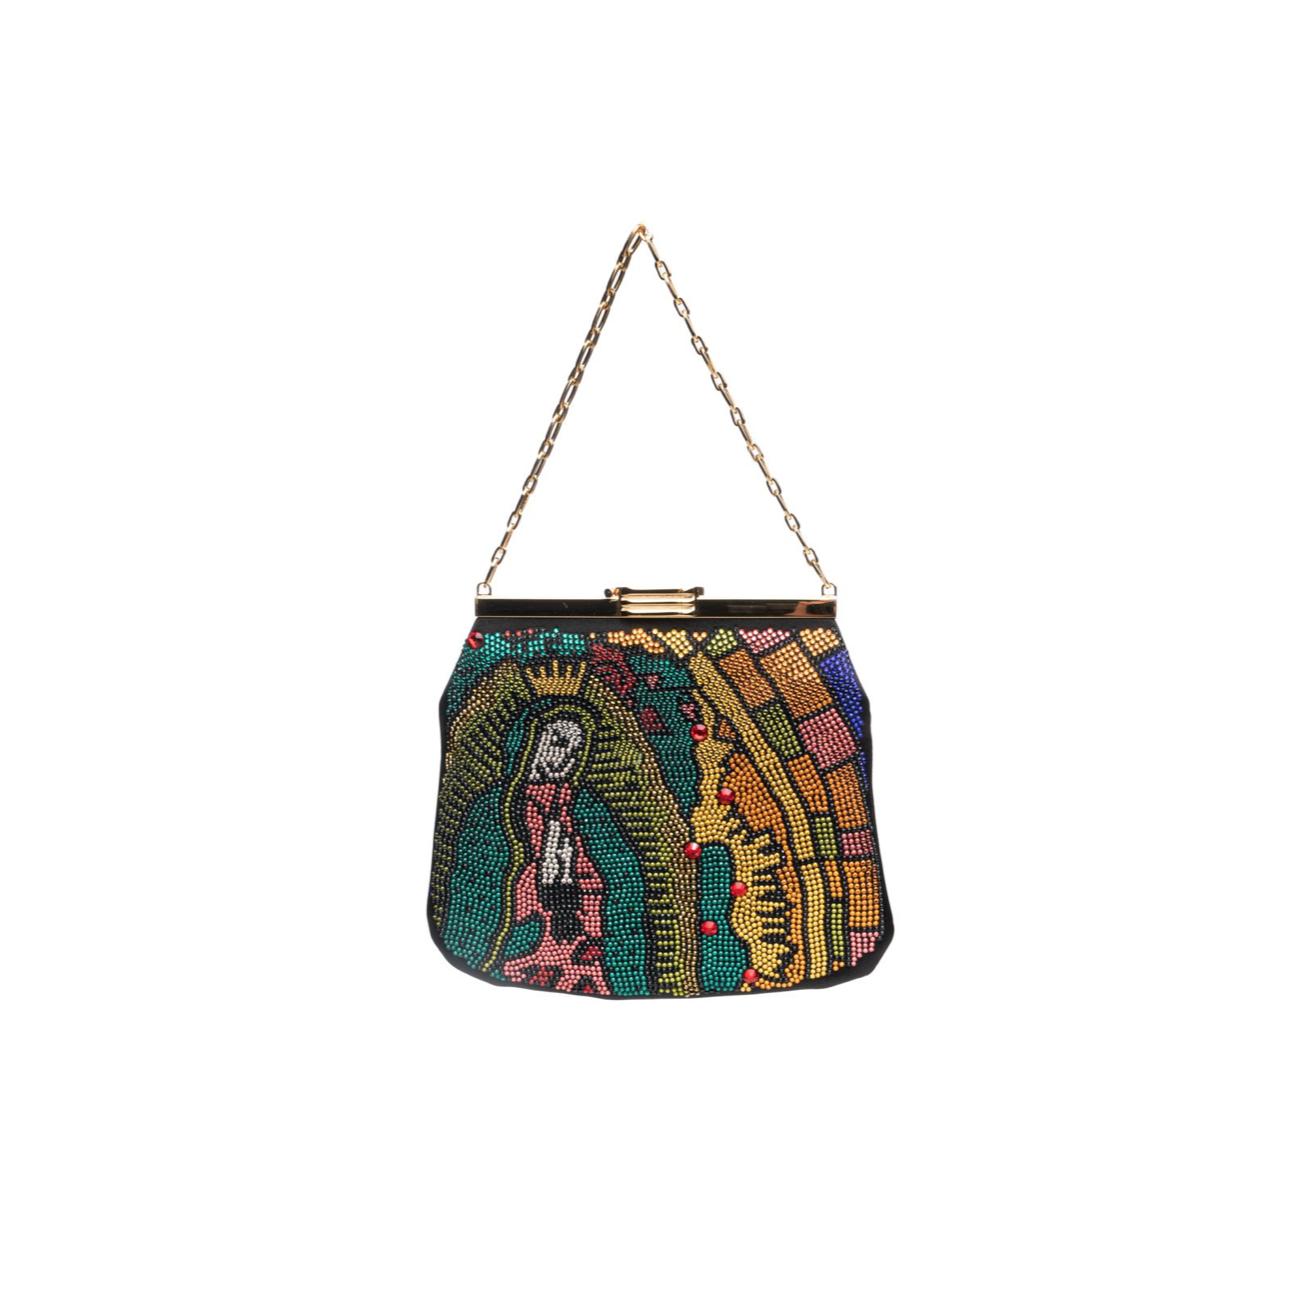 Bienen-Davis' Our Lady Of Guadalupe 4AM bag